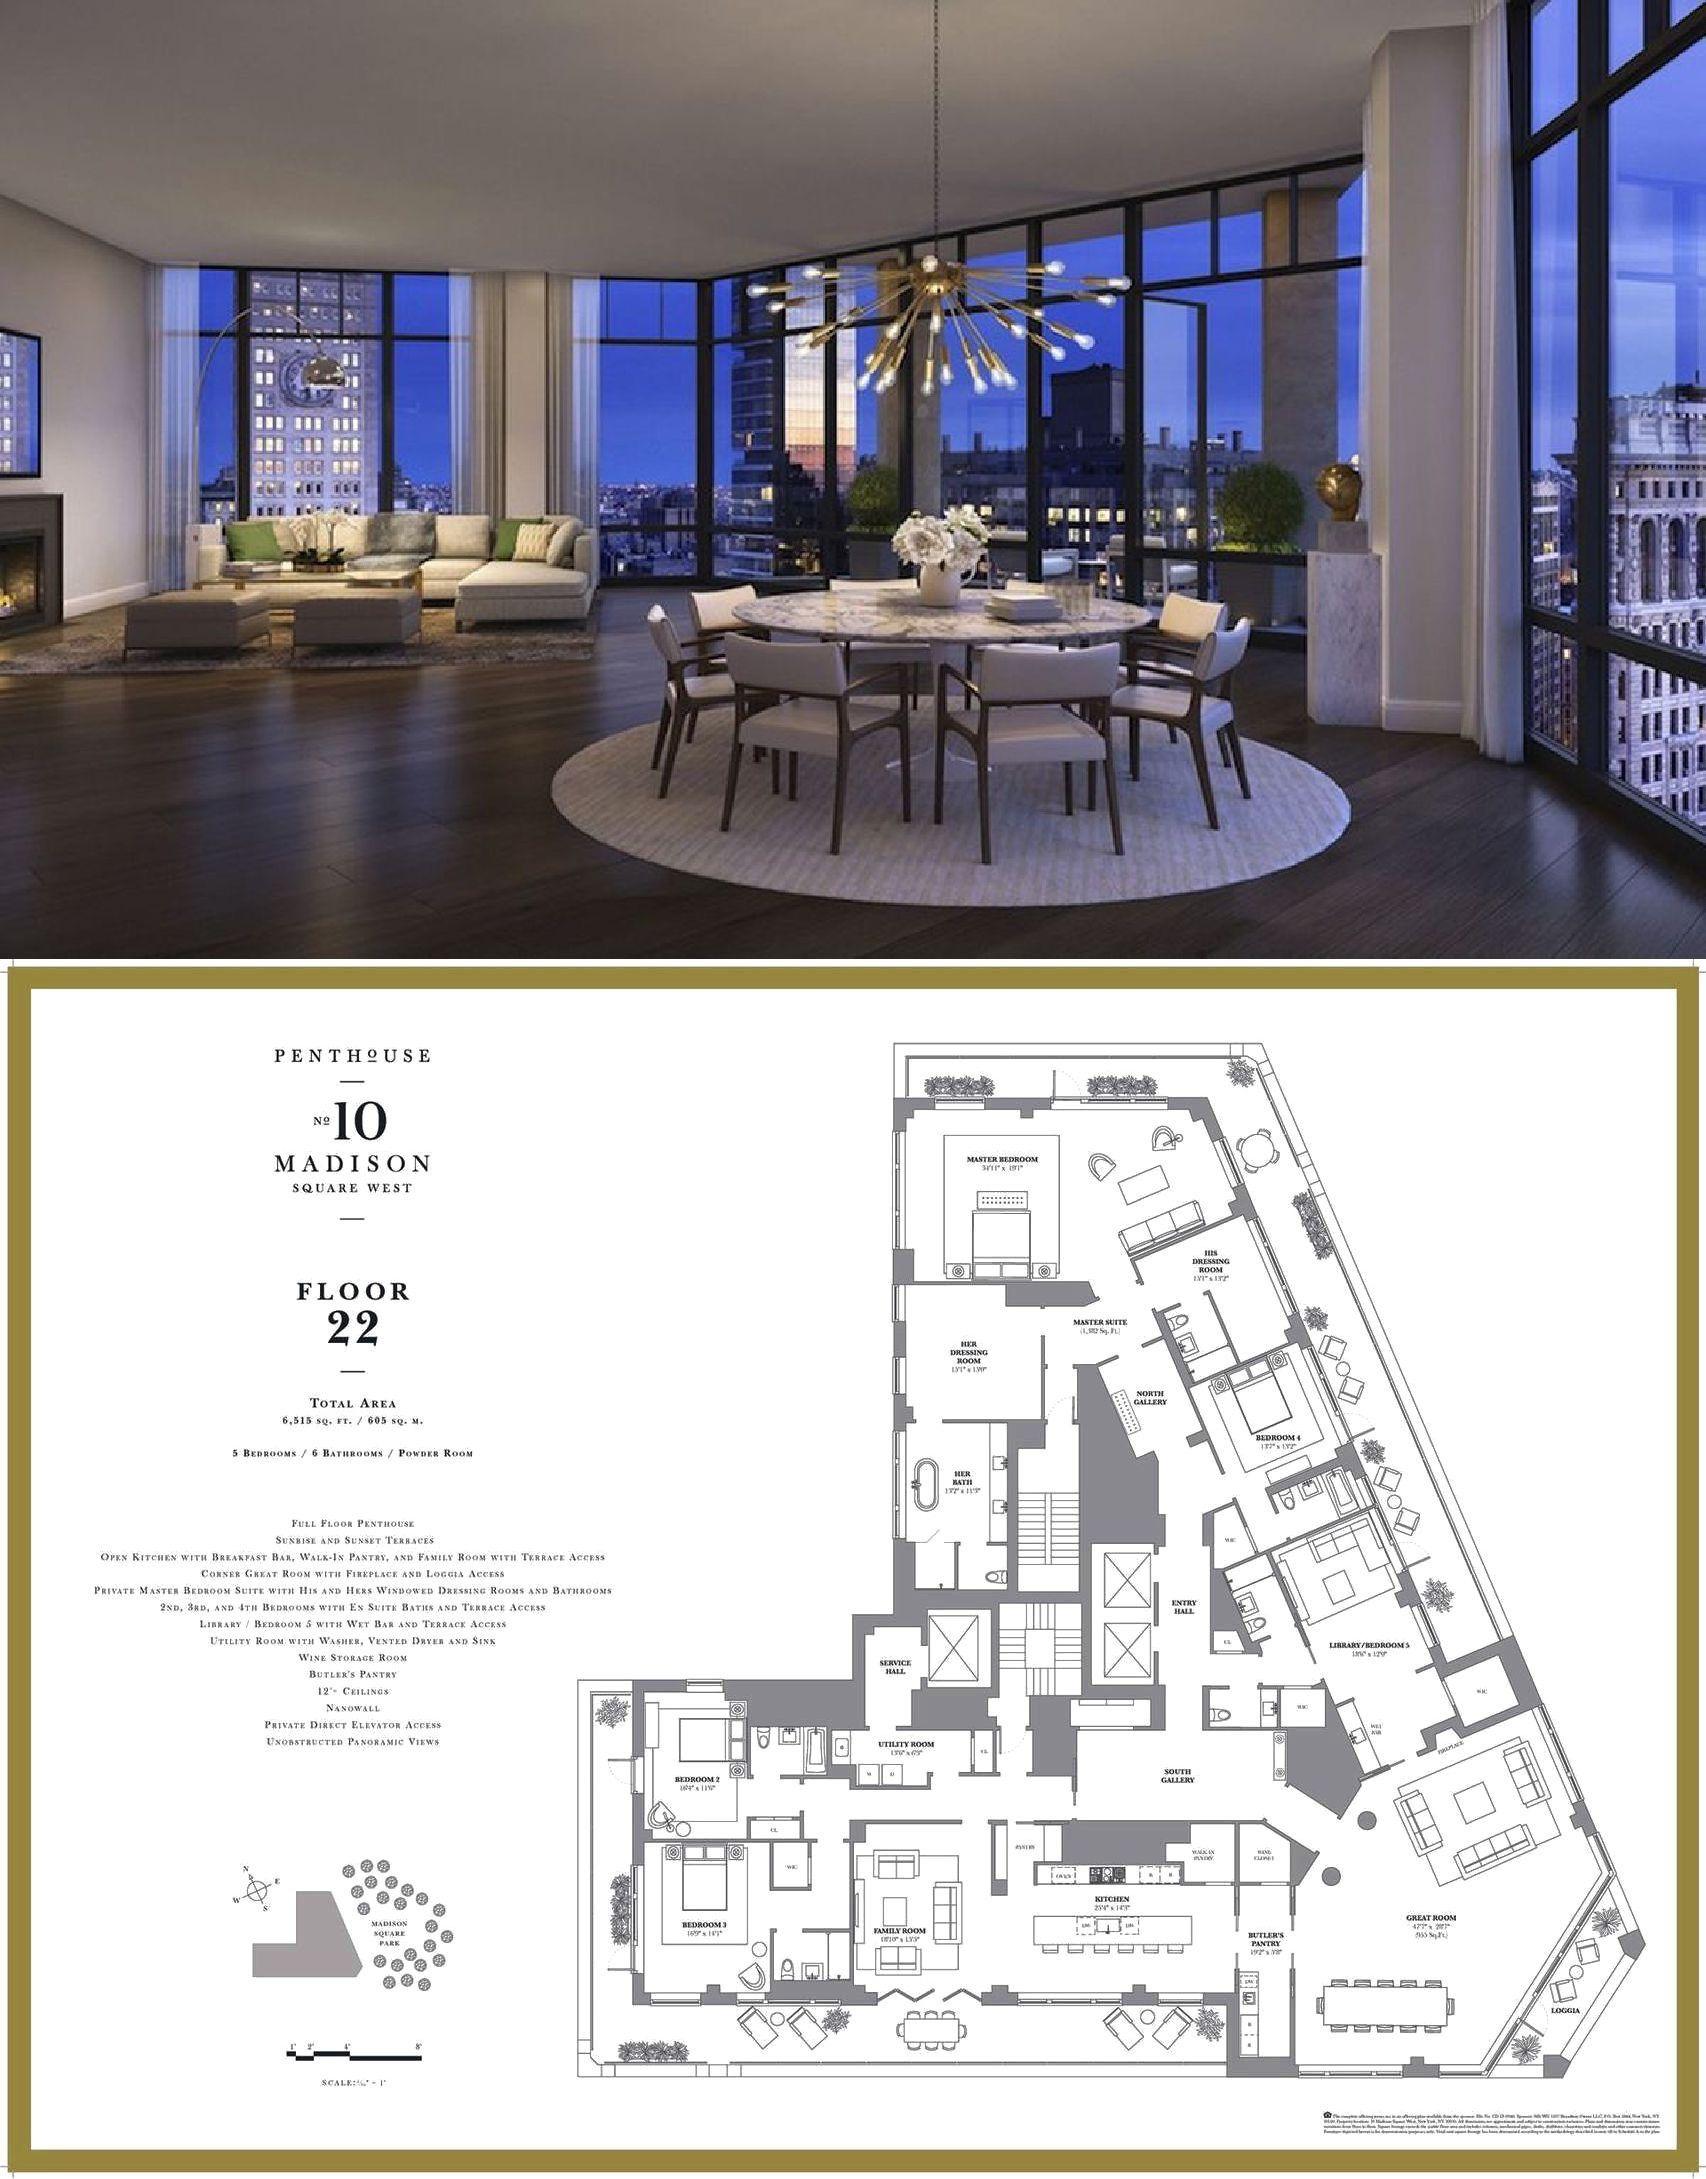 10 Madison Square West Phfl22 Flatiron District New York Architectural House Plans Apartment Floor Plans Vintage House Plans